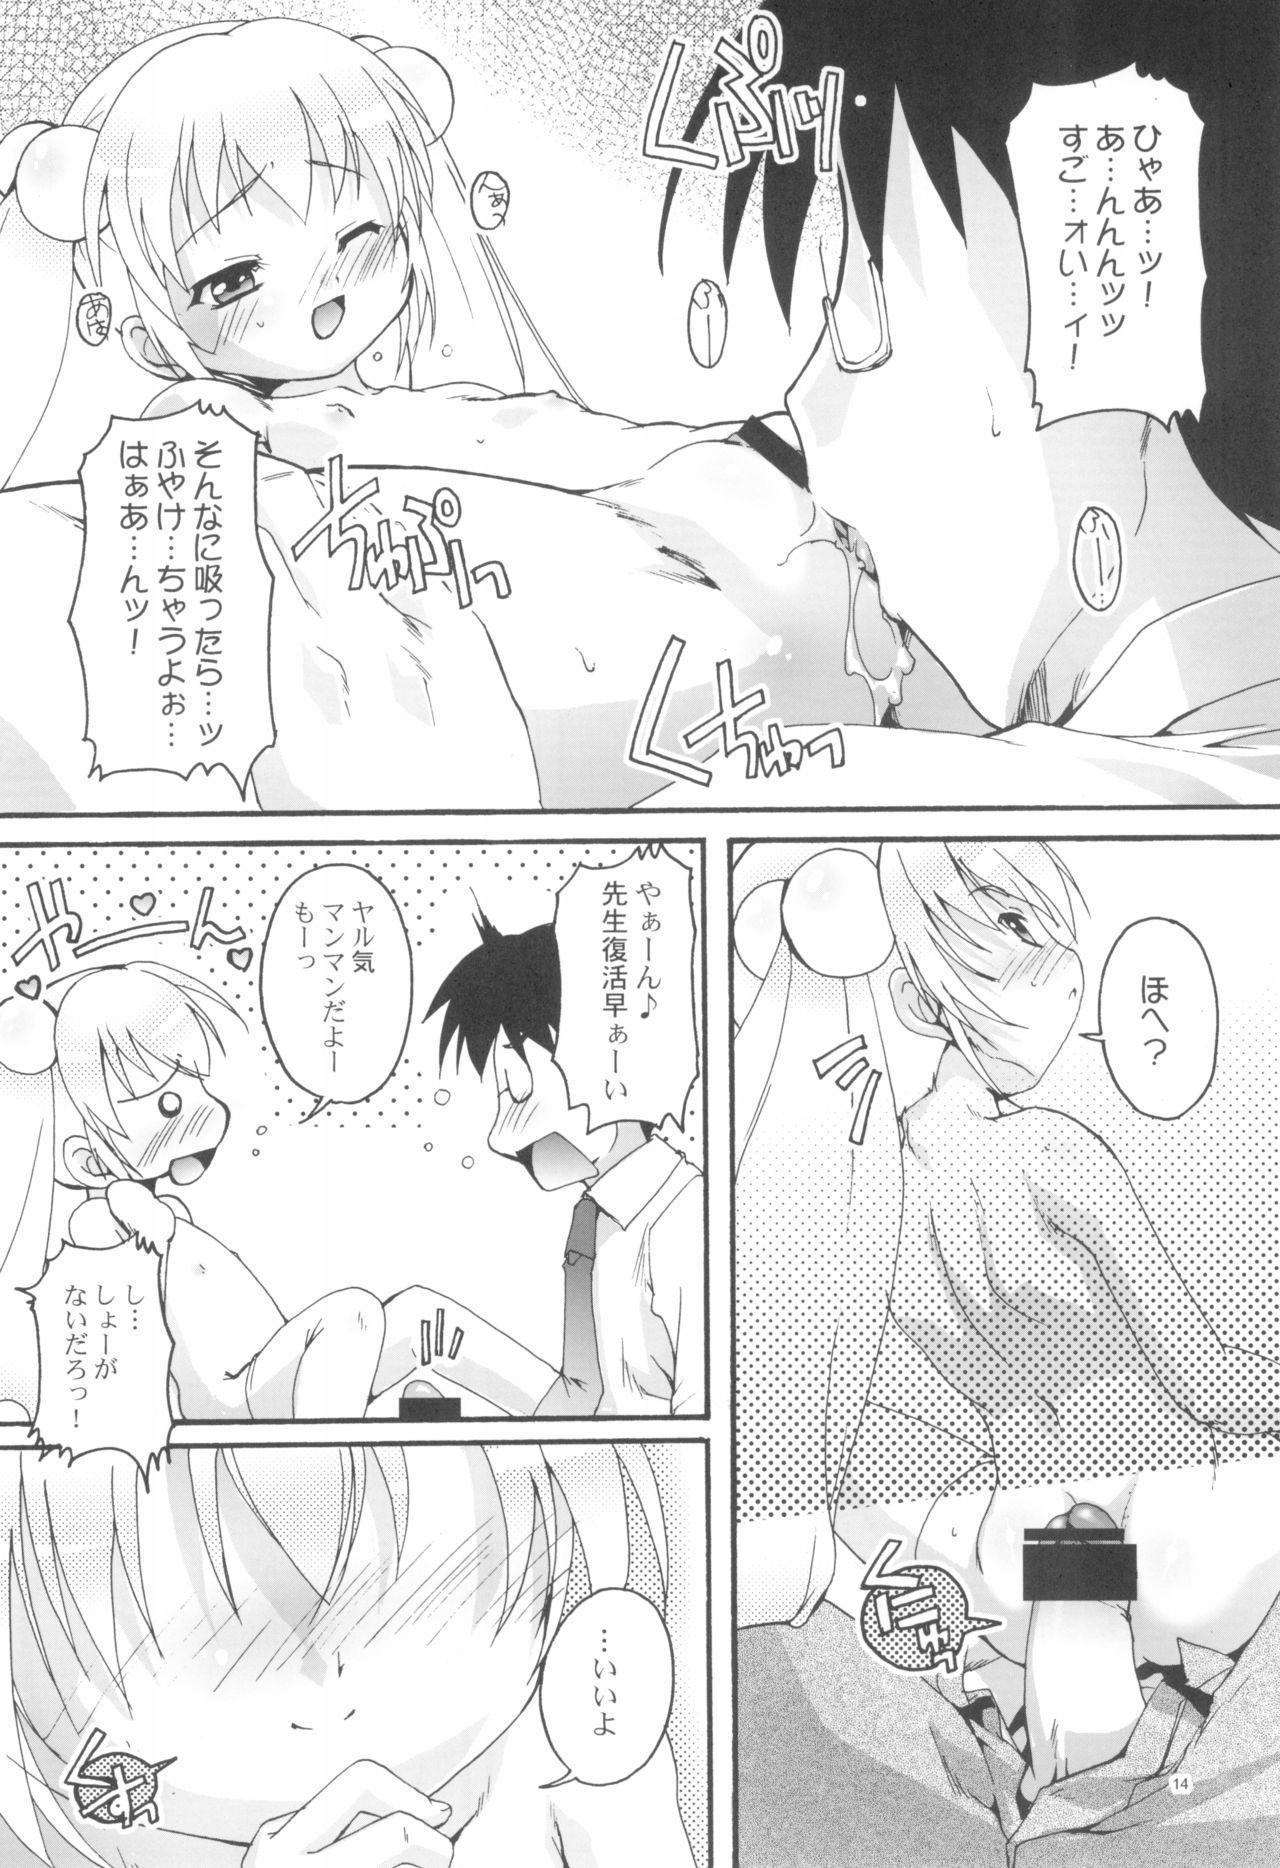 Kanzen Nenshou 15 15